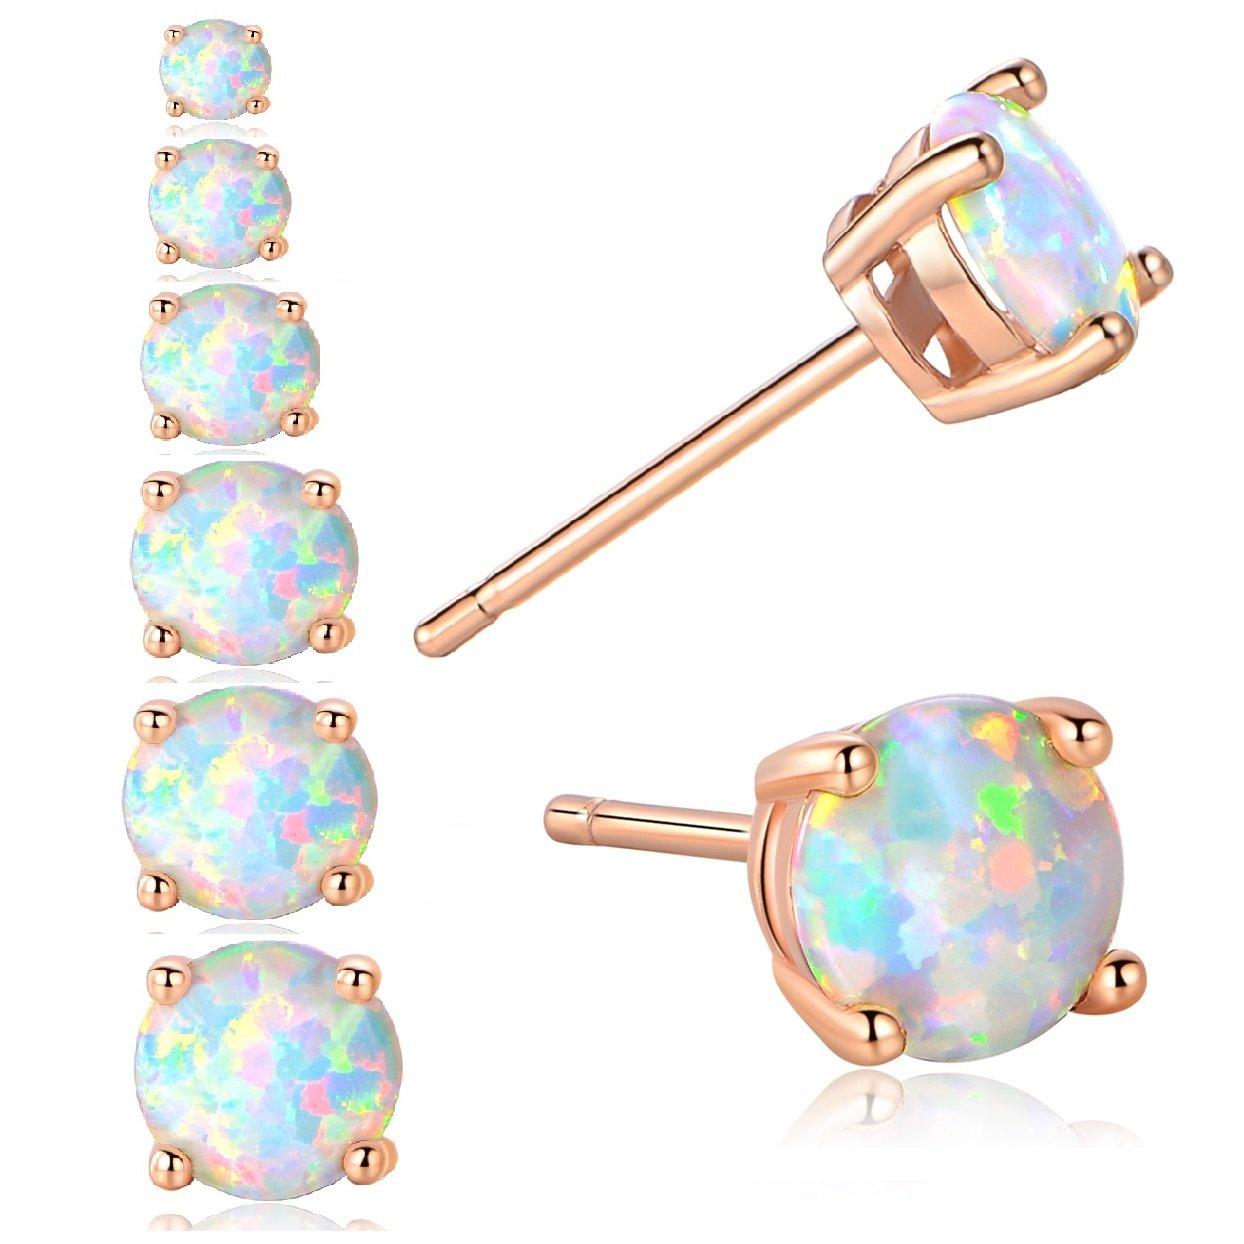 GEMSME 18K Rose Gold Plated 3/4/5/6/7/8mm Round Opal Stud Earrings Pack of 6